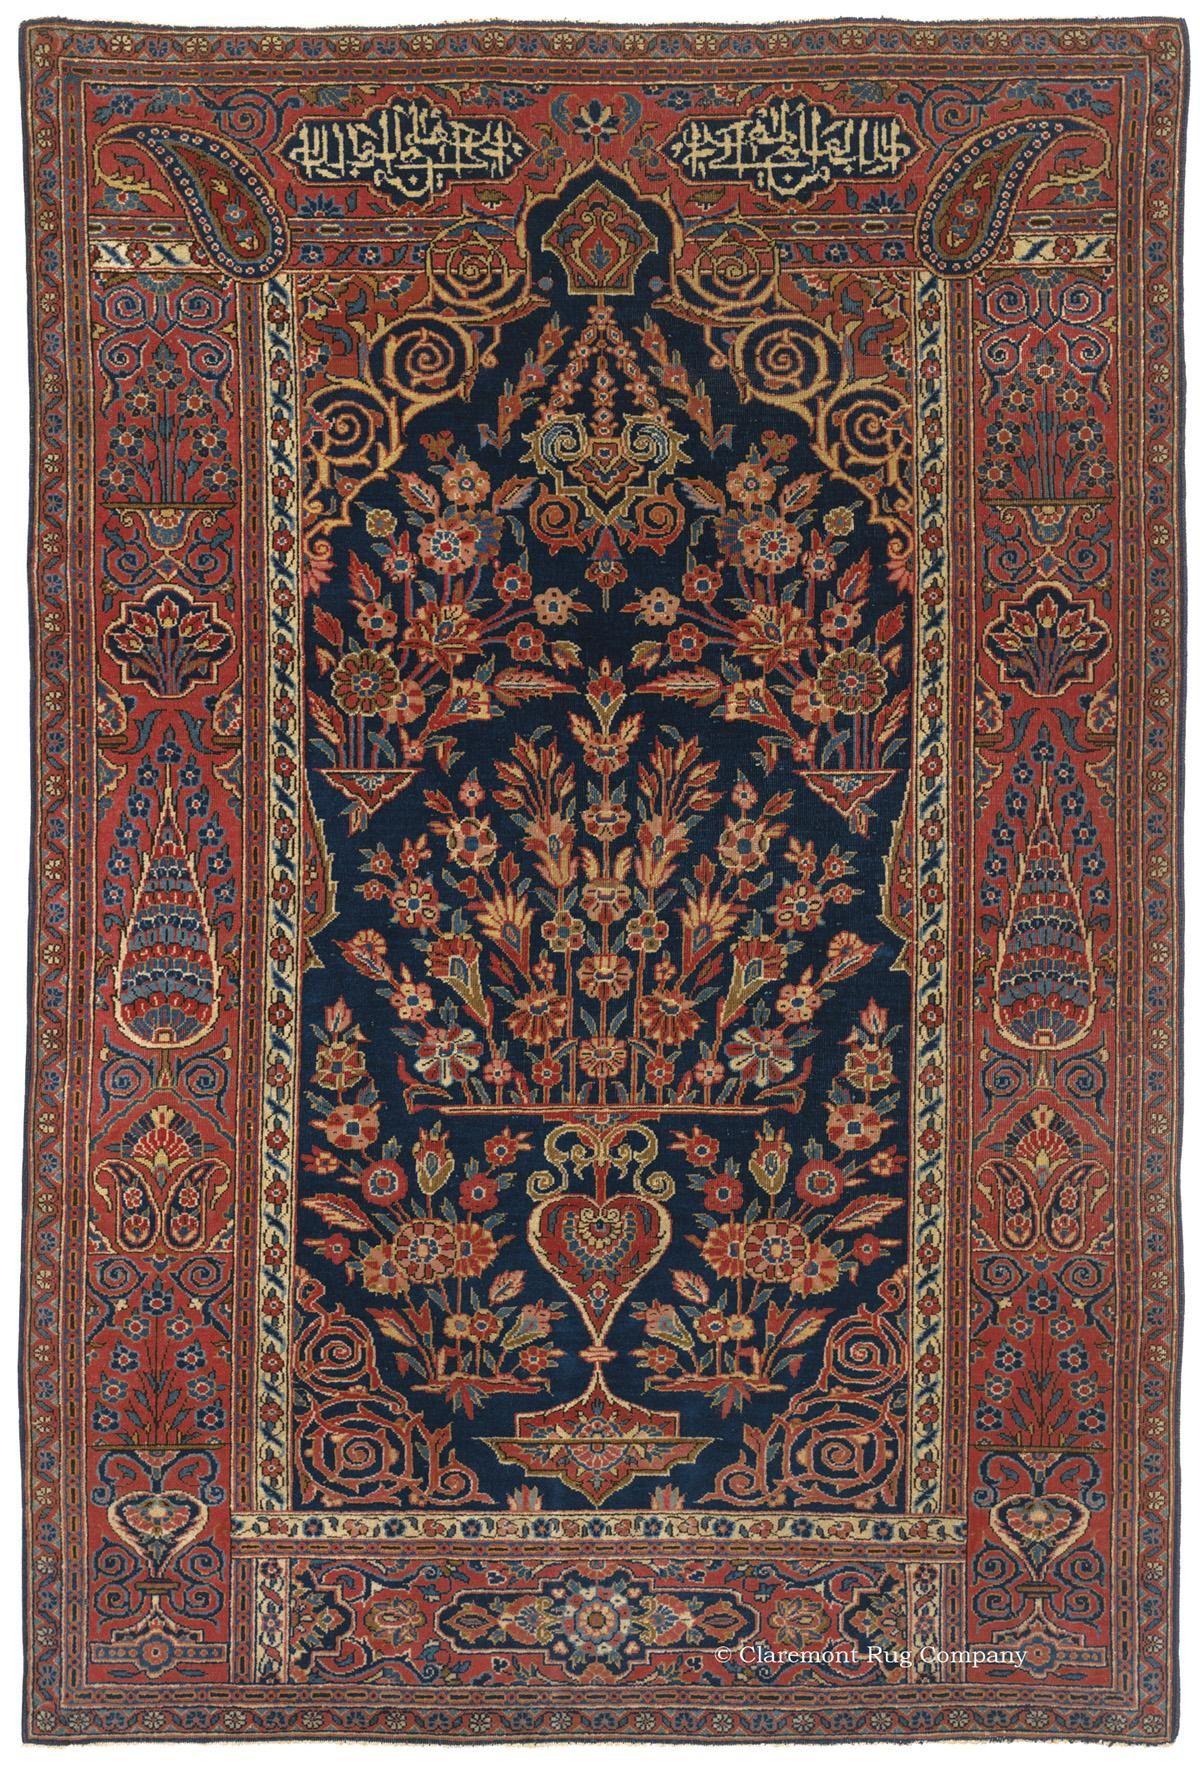 Rare Antique Rug Collectible Persian Kashan Prayer